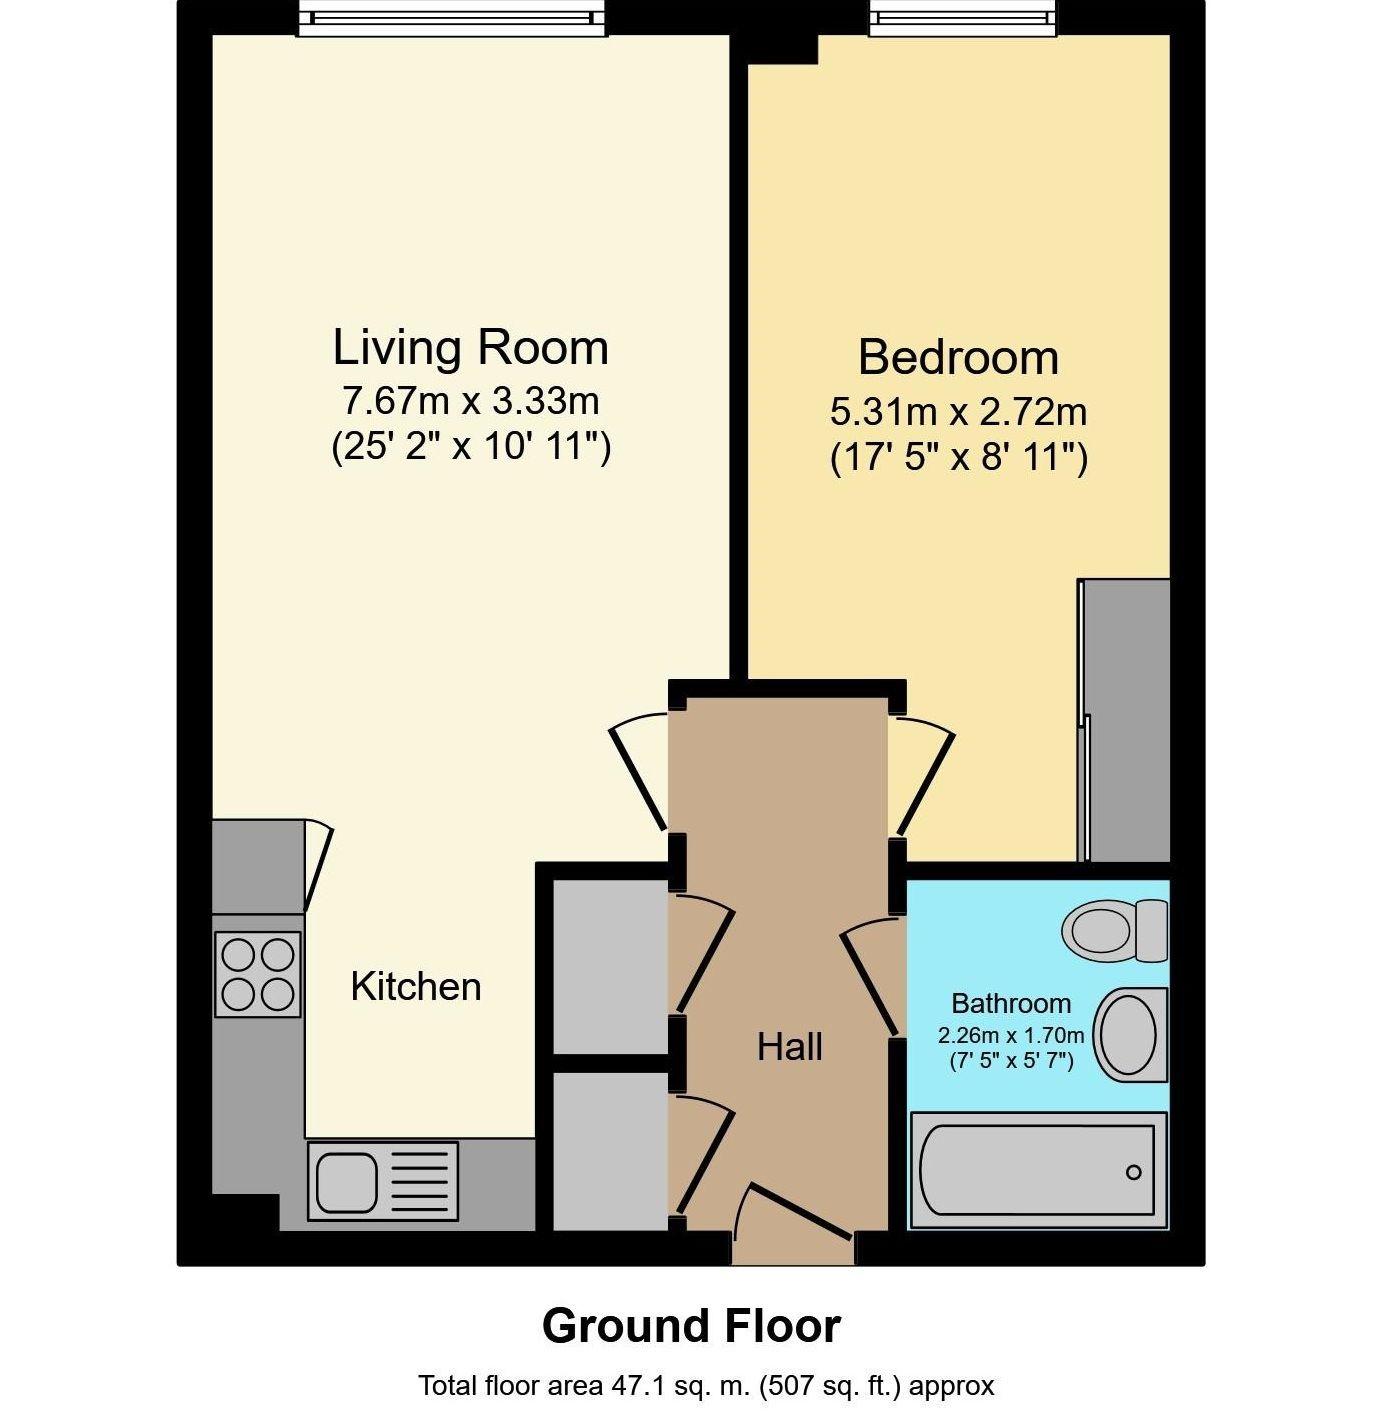 1 bedroom apartment For Sale in Sevenoaks - Floorplan 1